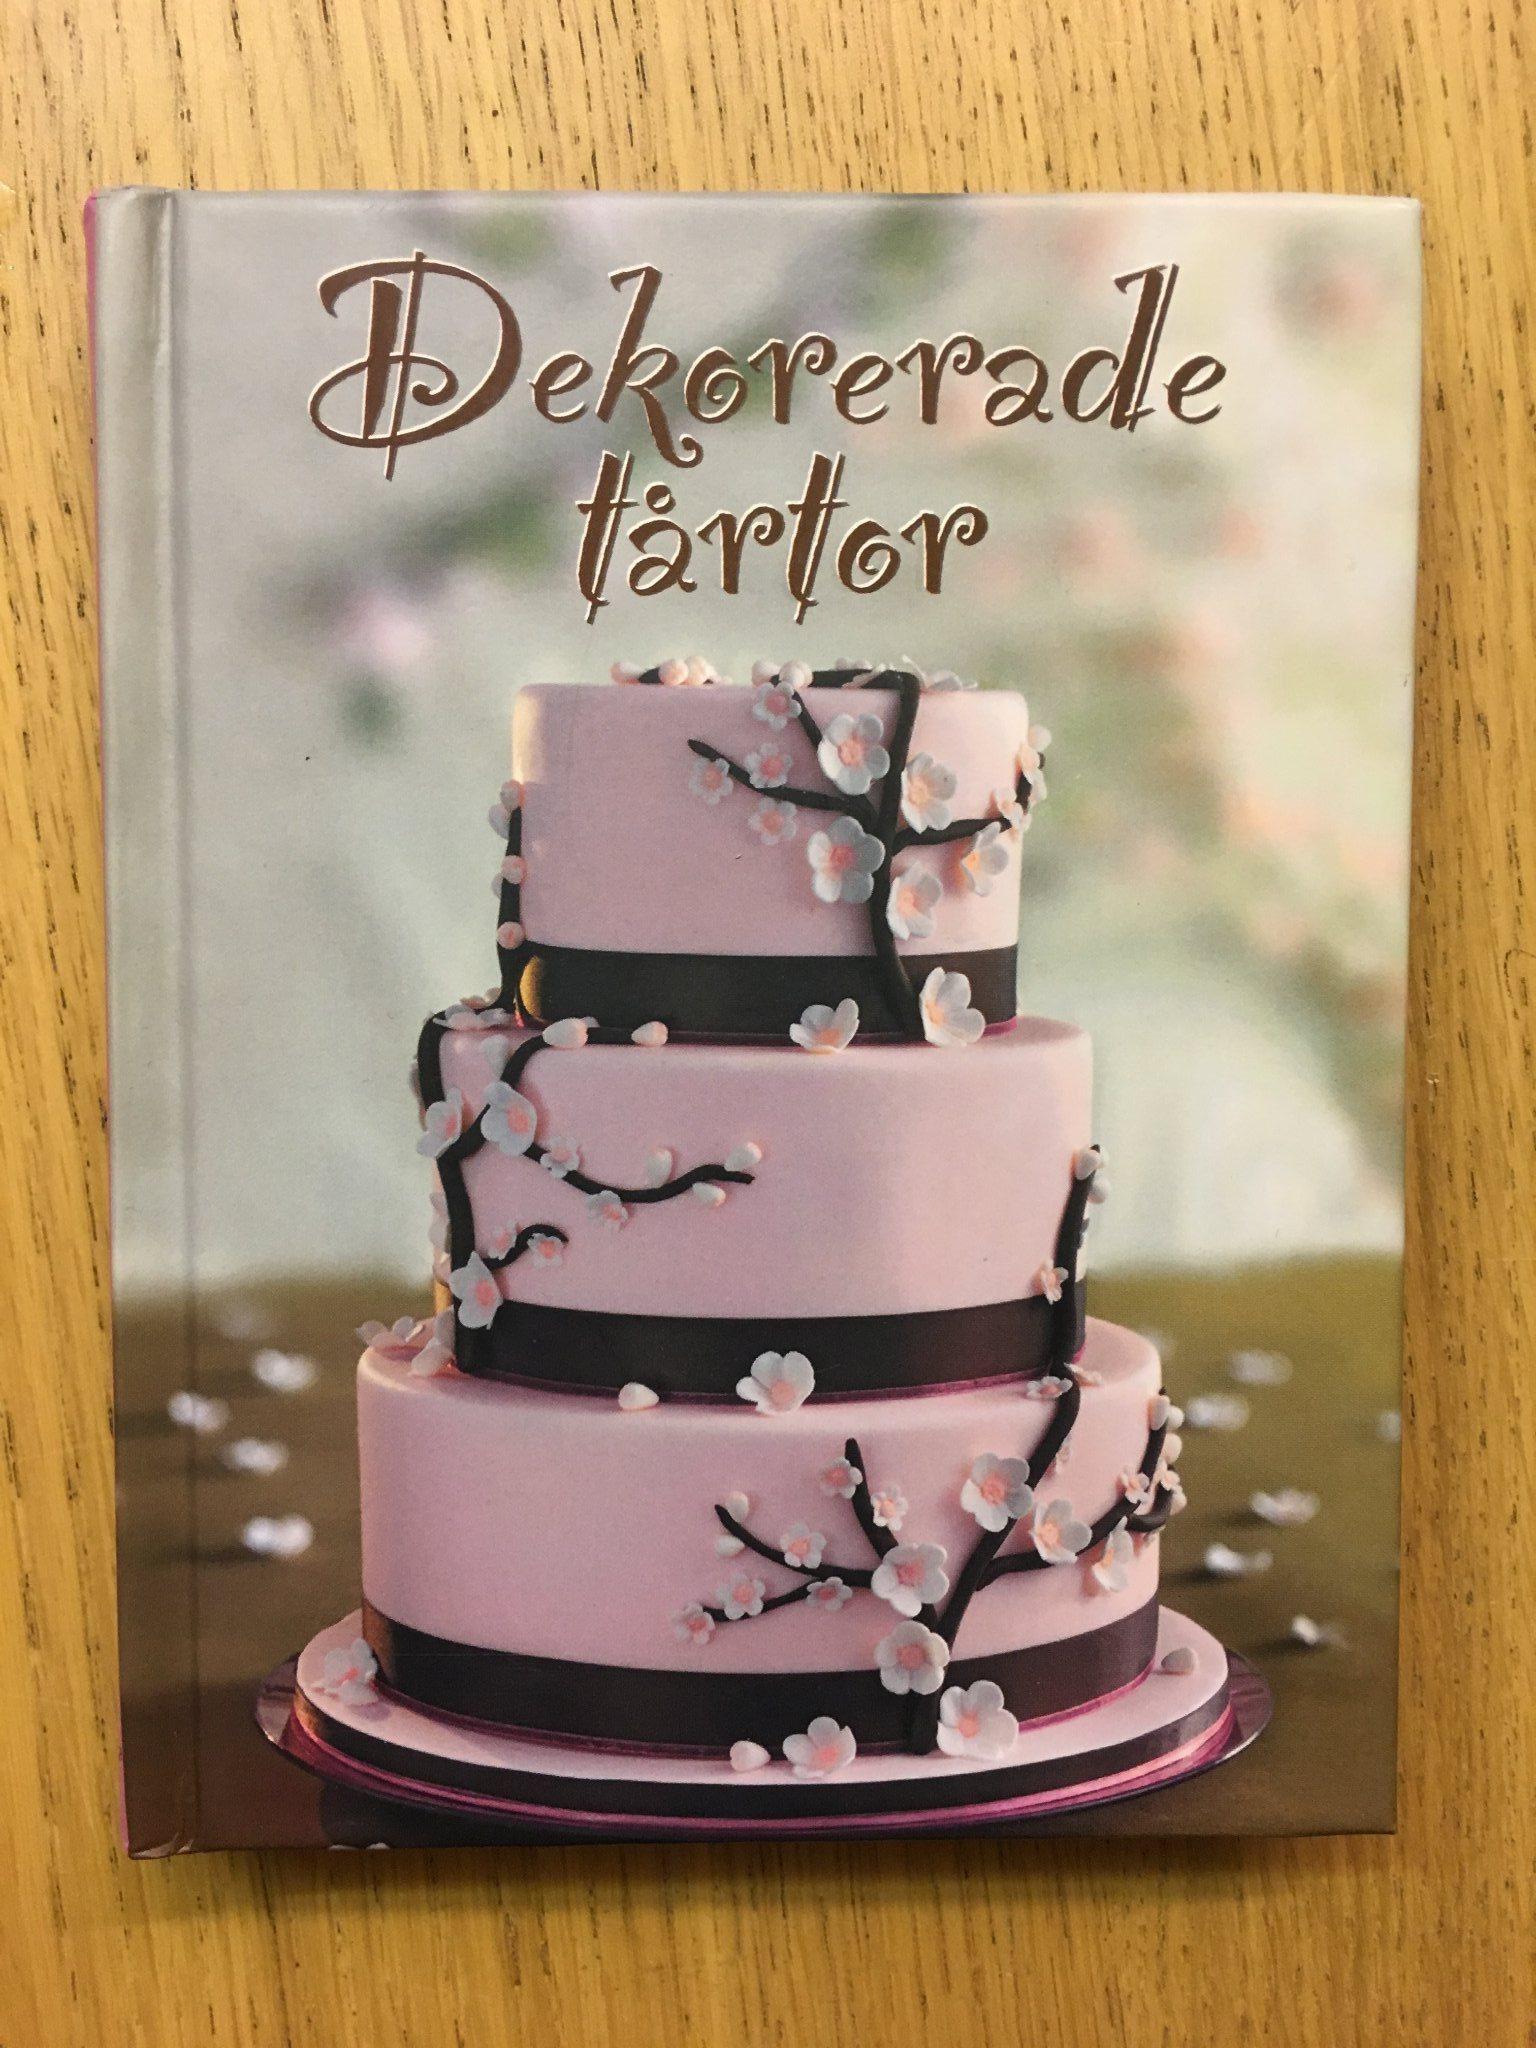 dekoration tårta steg för steg